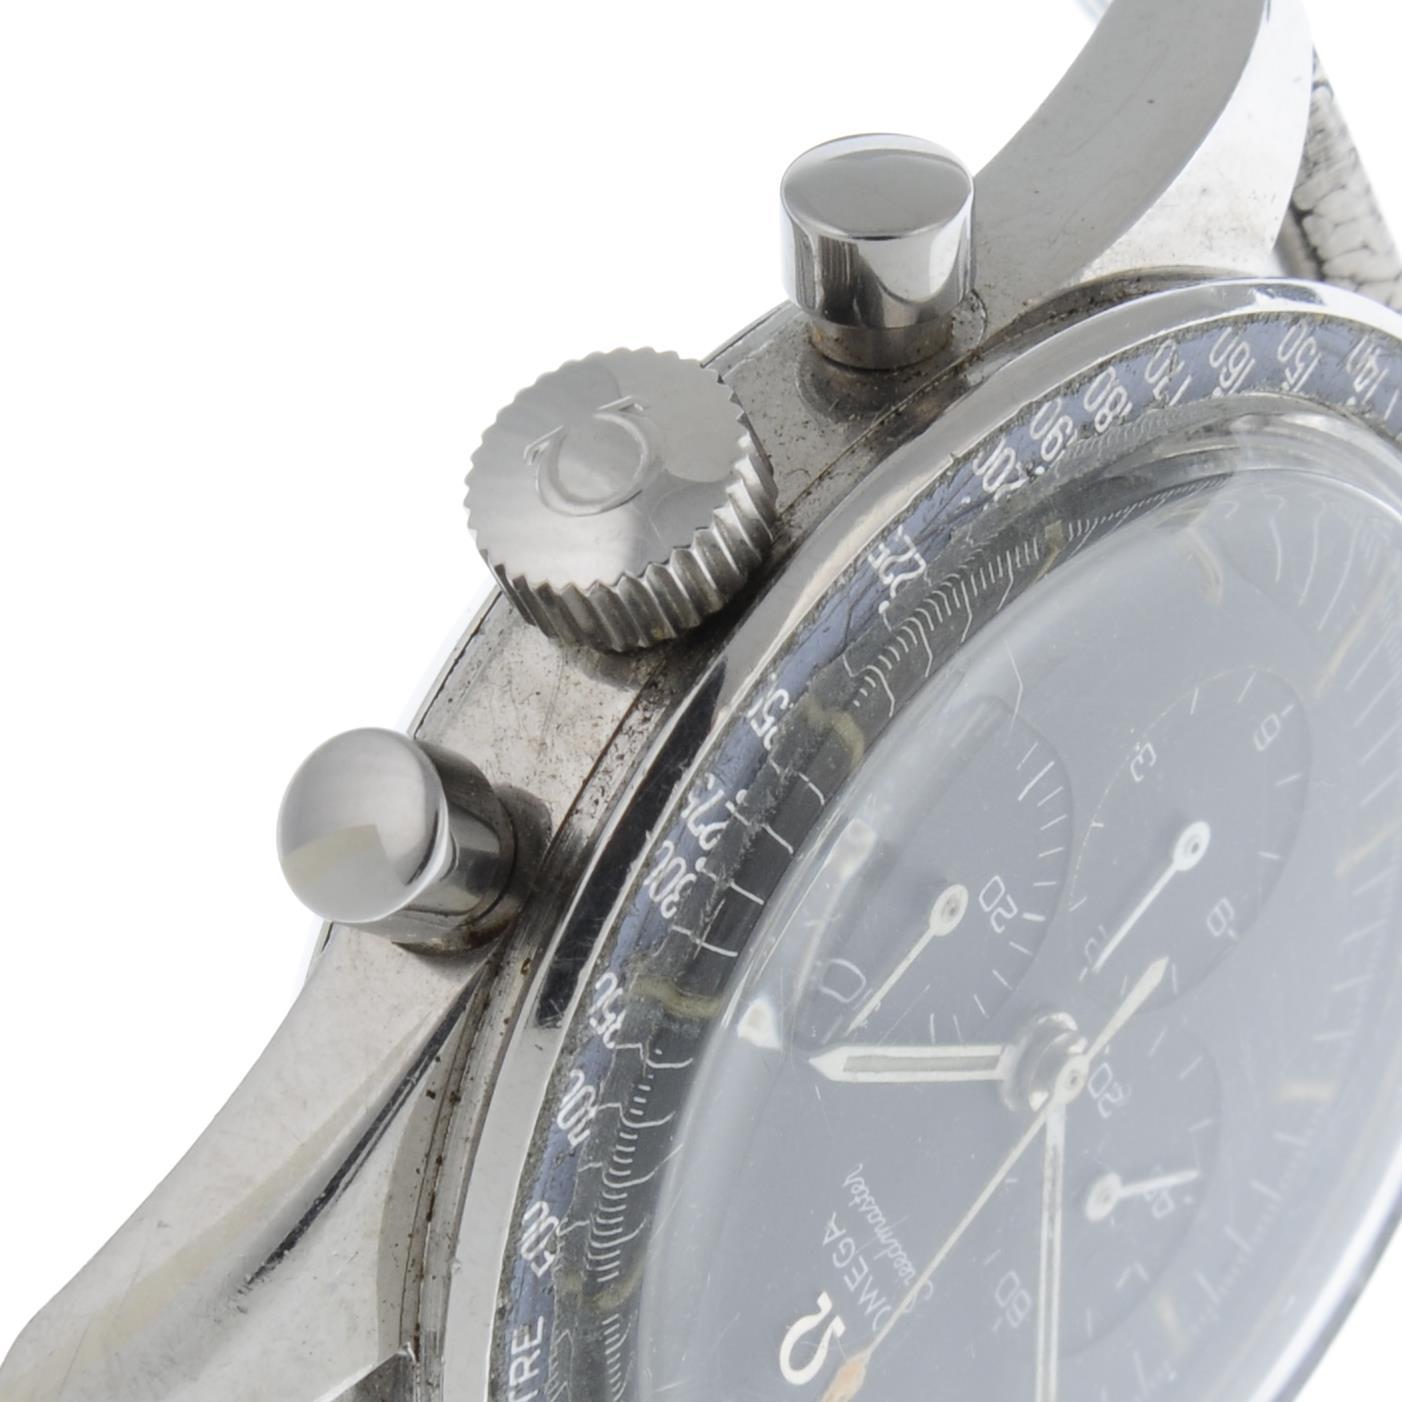 OMEGA - a Speedmaster 'Ed White' chronograph bracelet watch. - Image 4 of 5